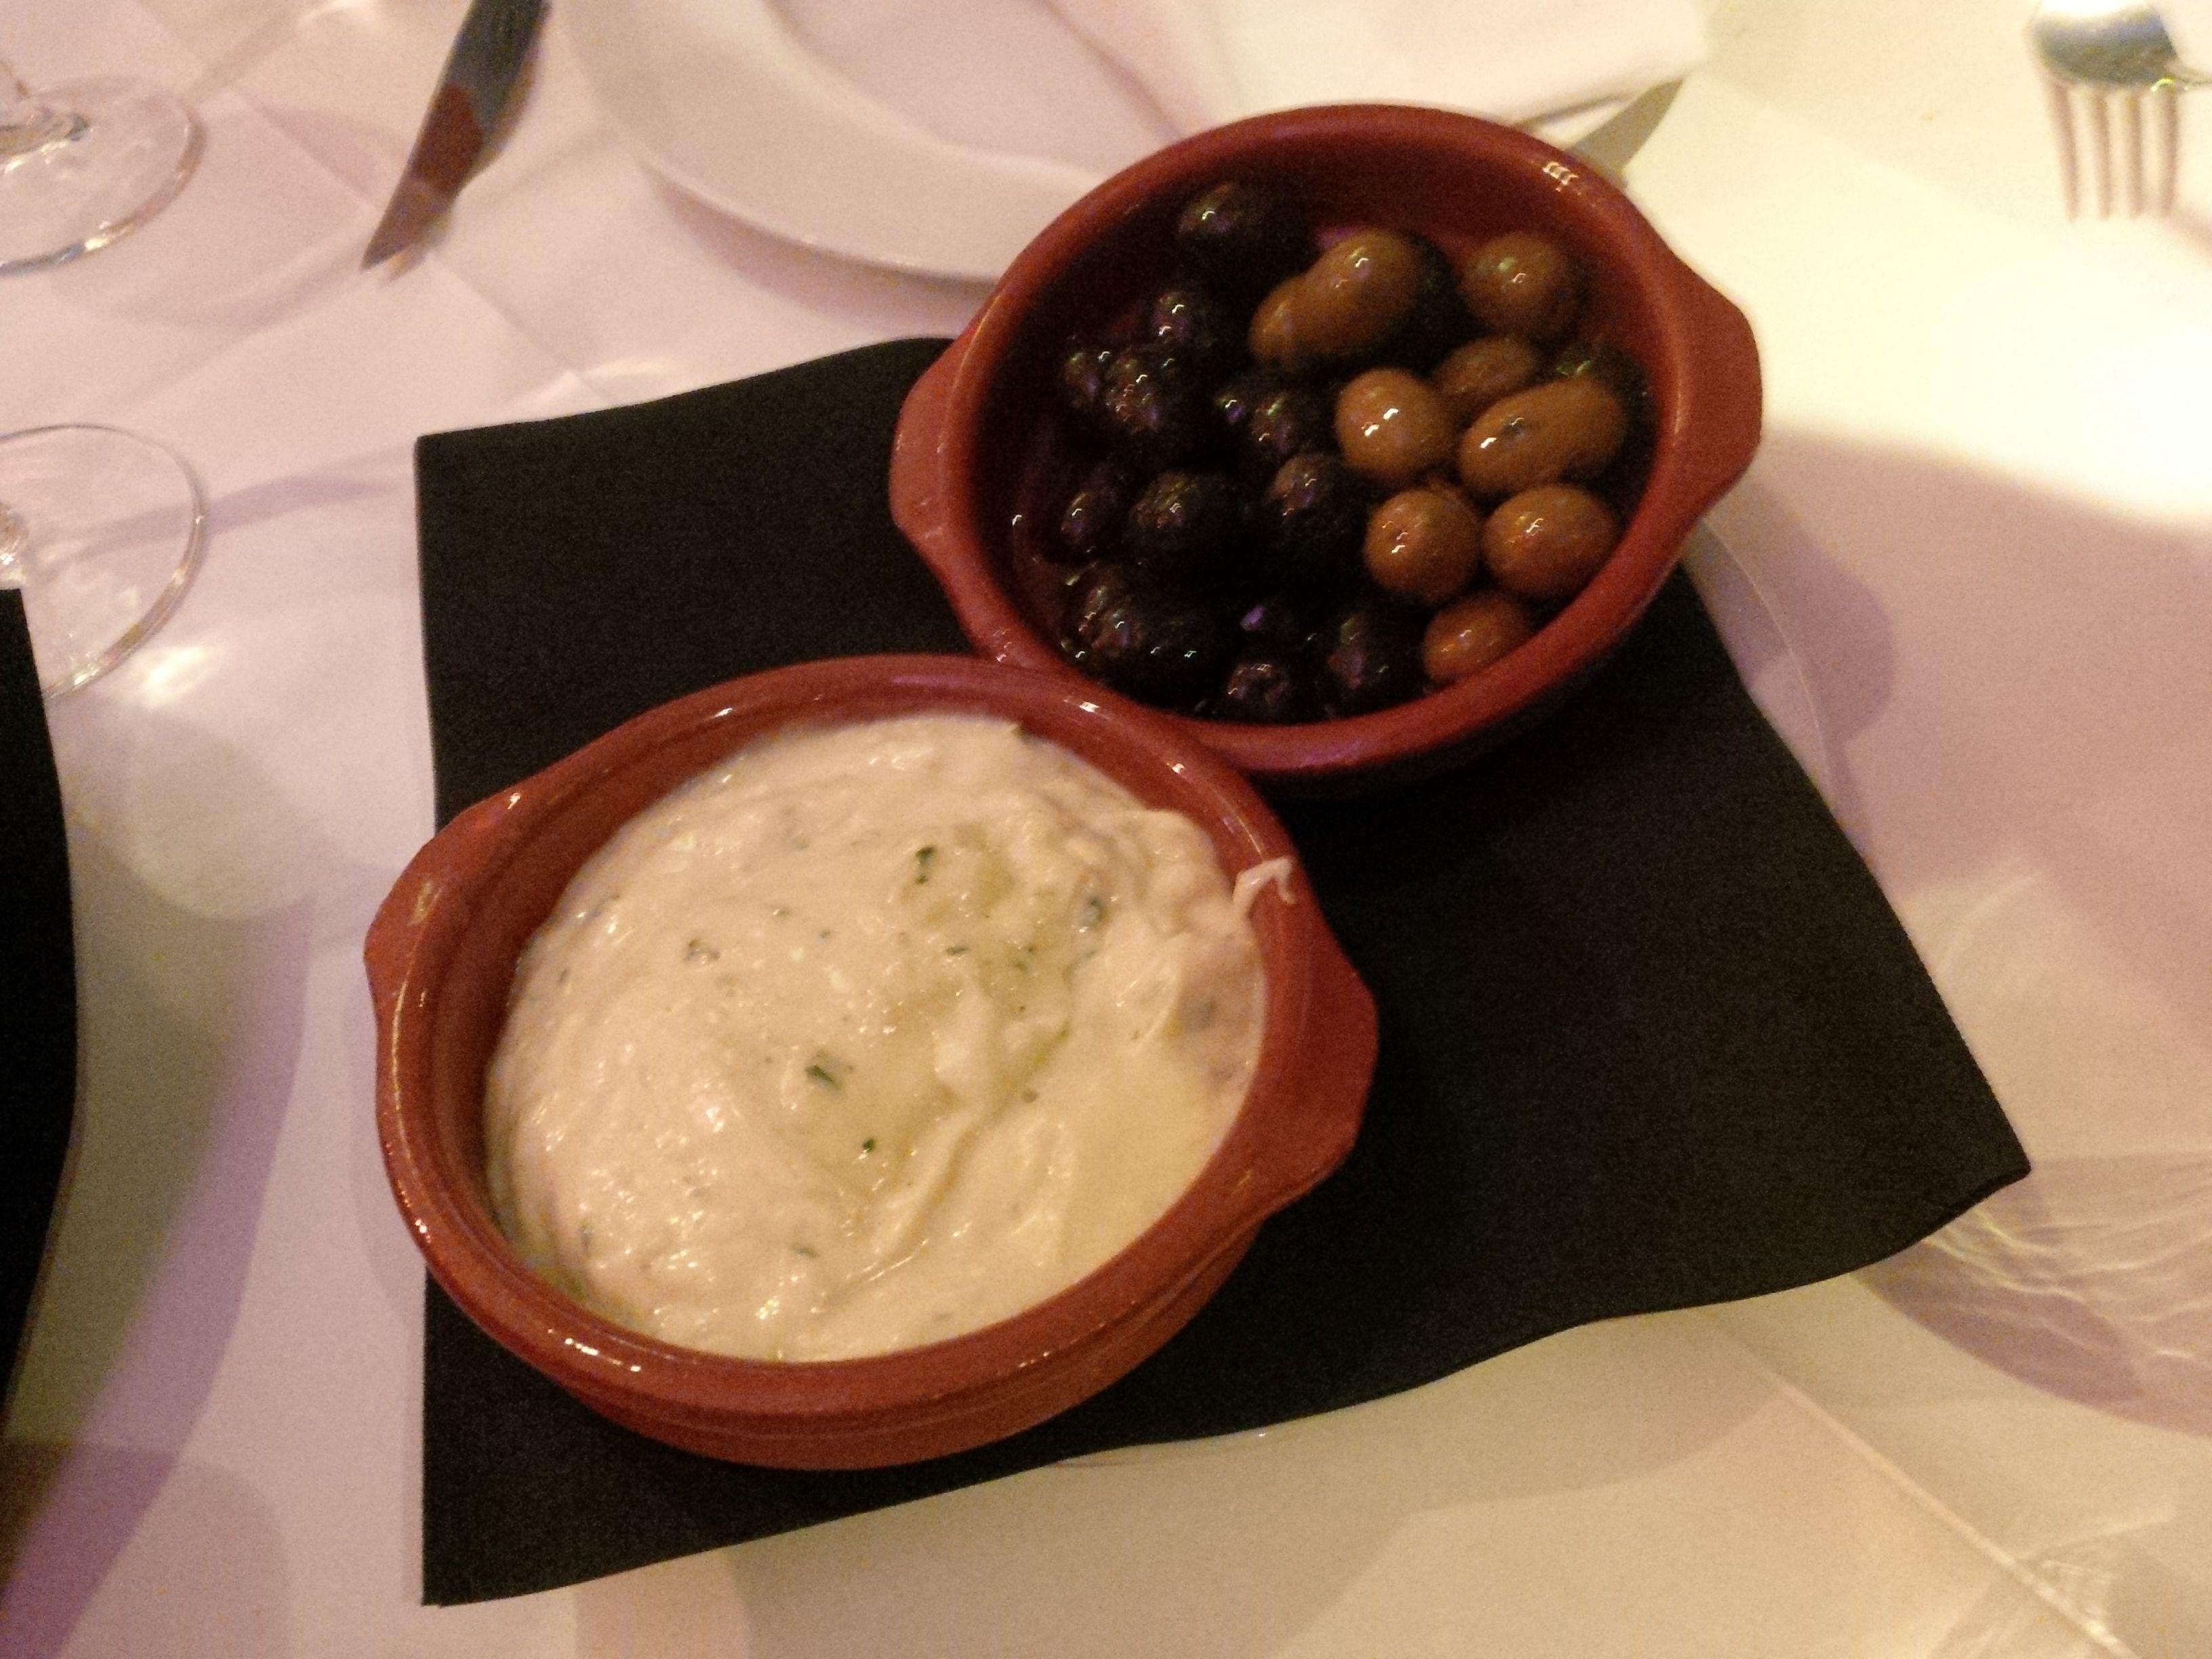 Ajoli with olives and bread @ Restaurant Caramba Especial